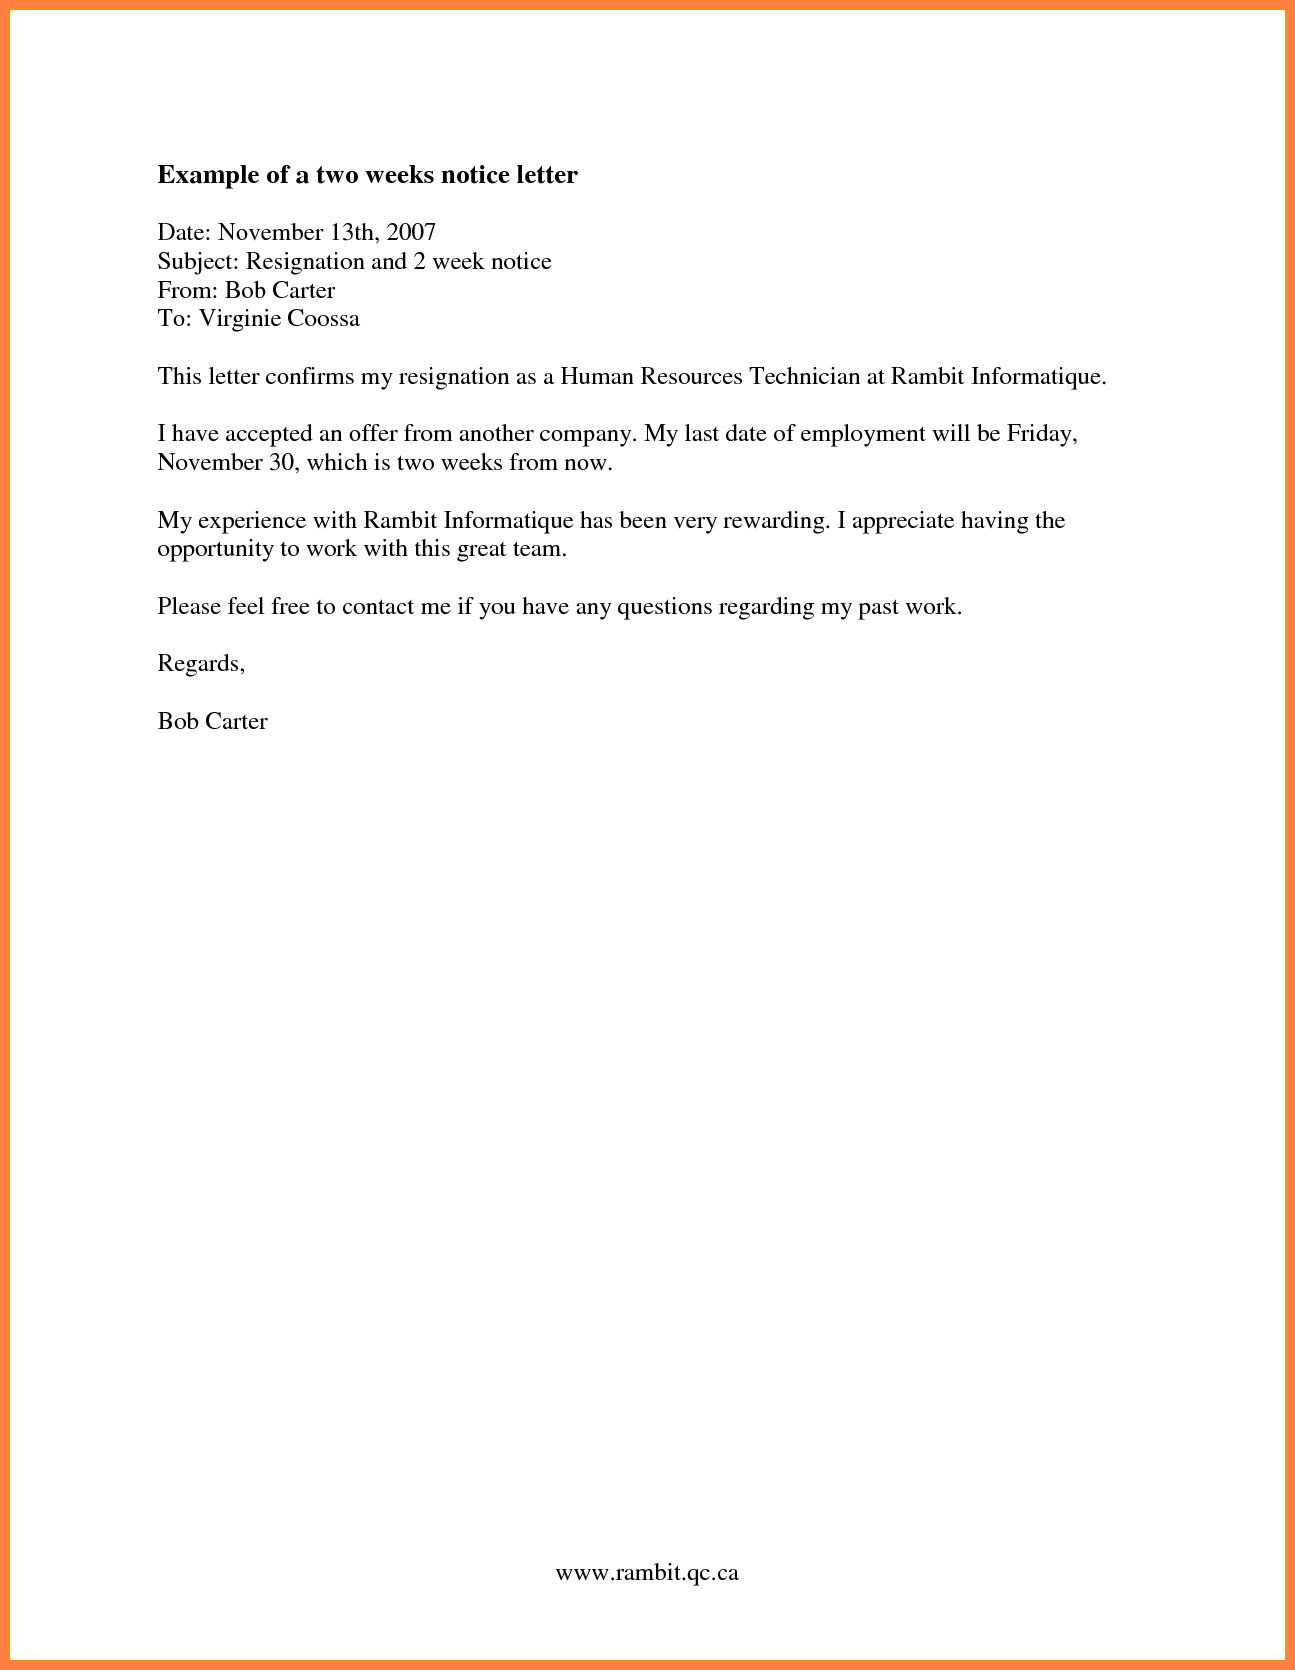 Sample Resignation Letter Nurse 8 Resignation Letter 2 Week Notice Nurse